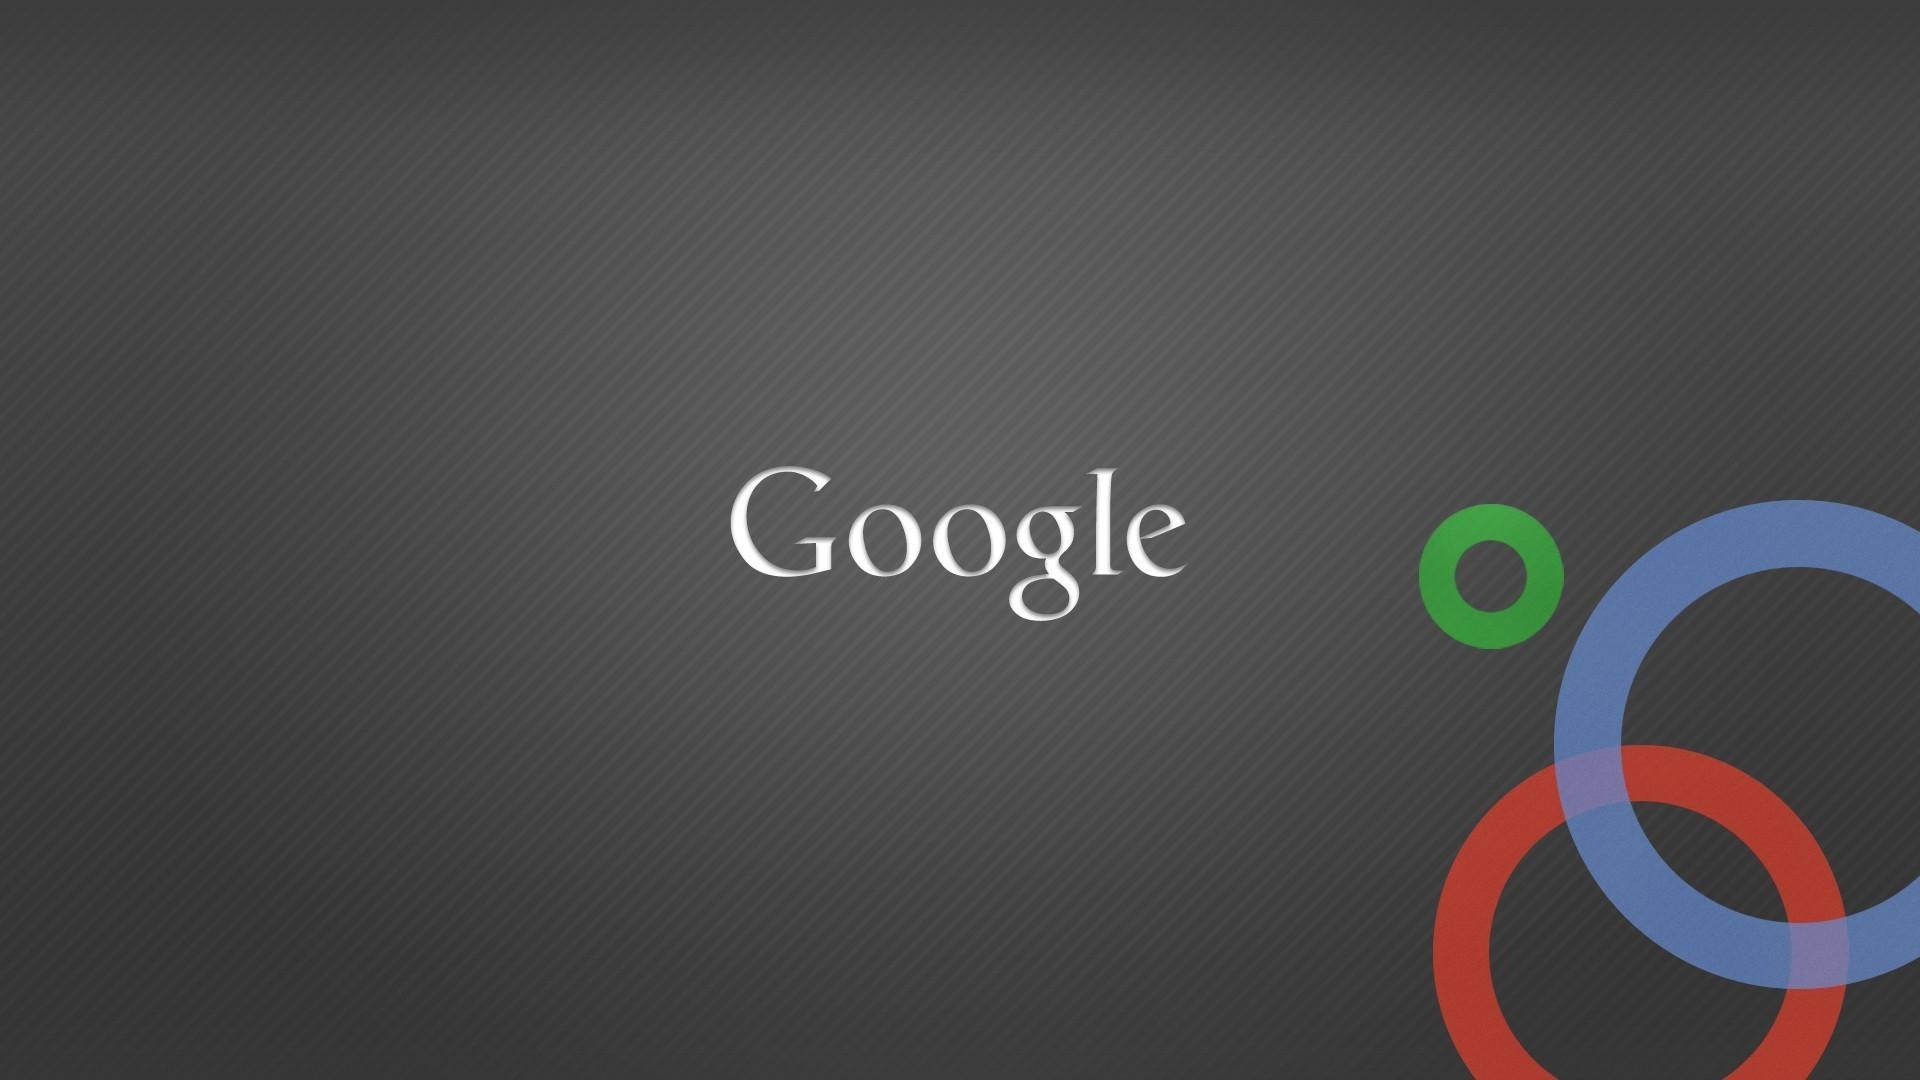 Free Live Fall Wallpapers For Desktop Google Chrome Wallpaper Background 183 ① Wallpapertag